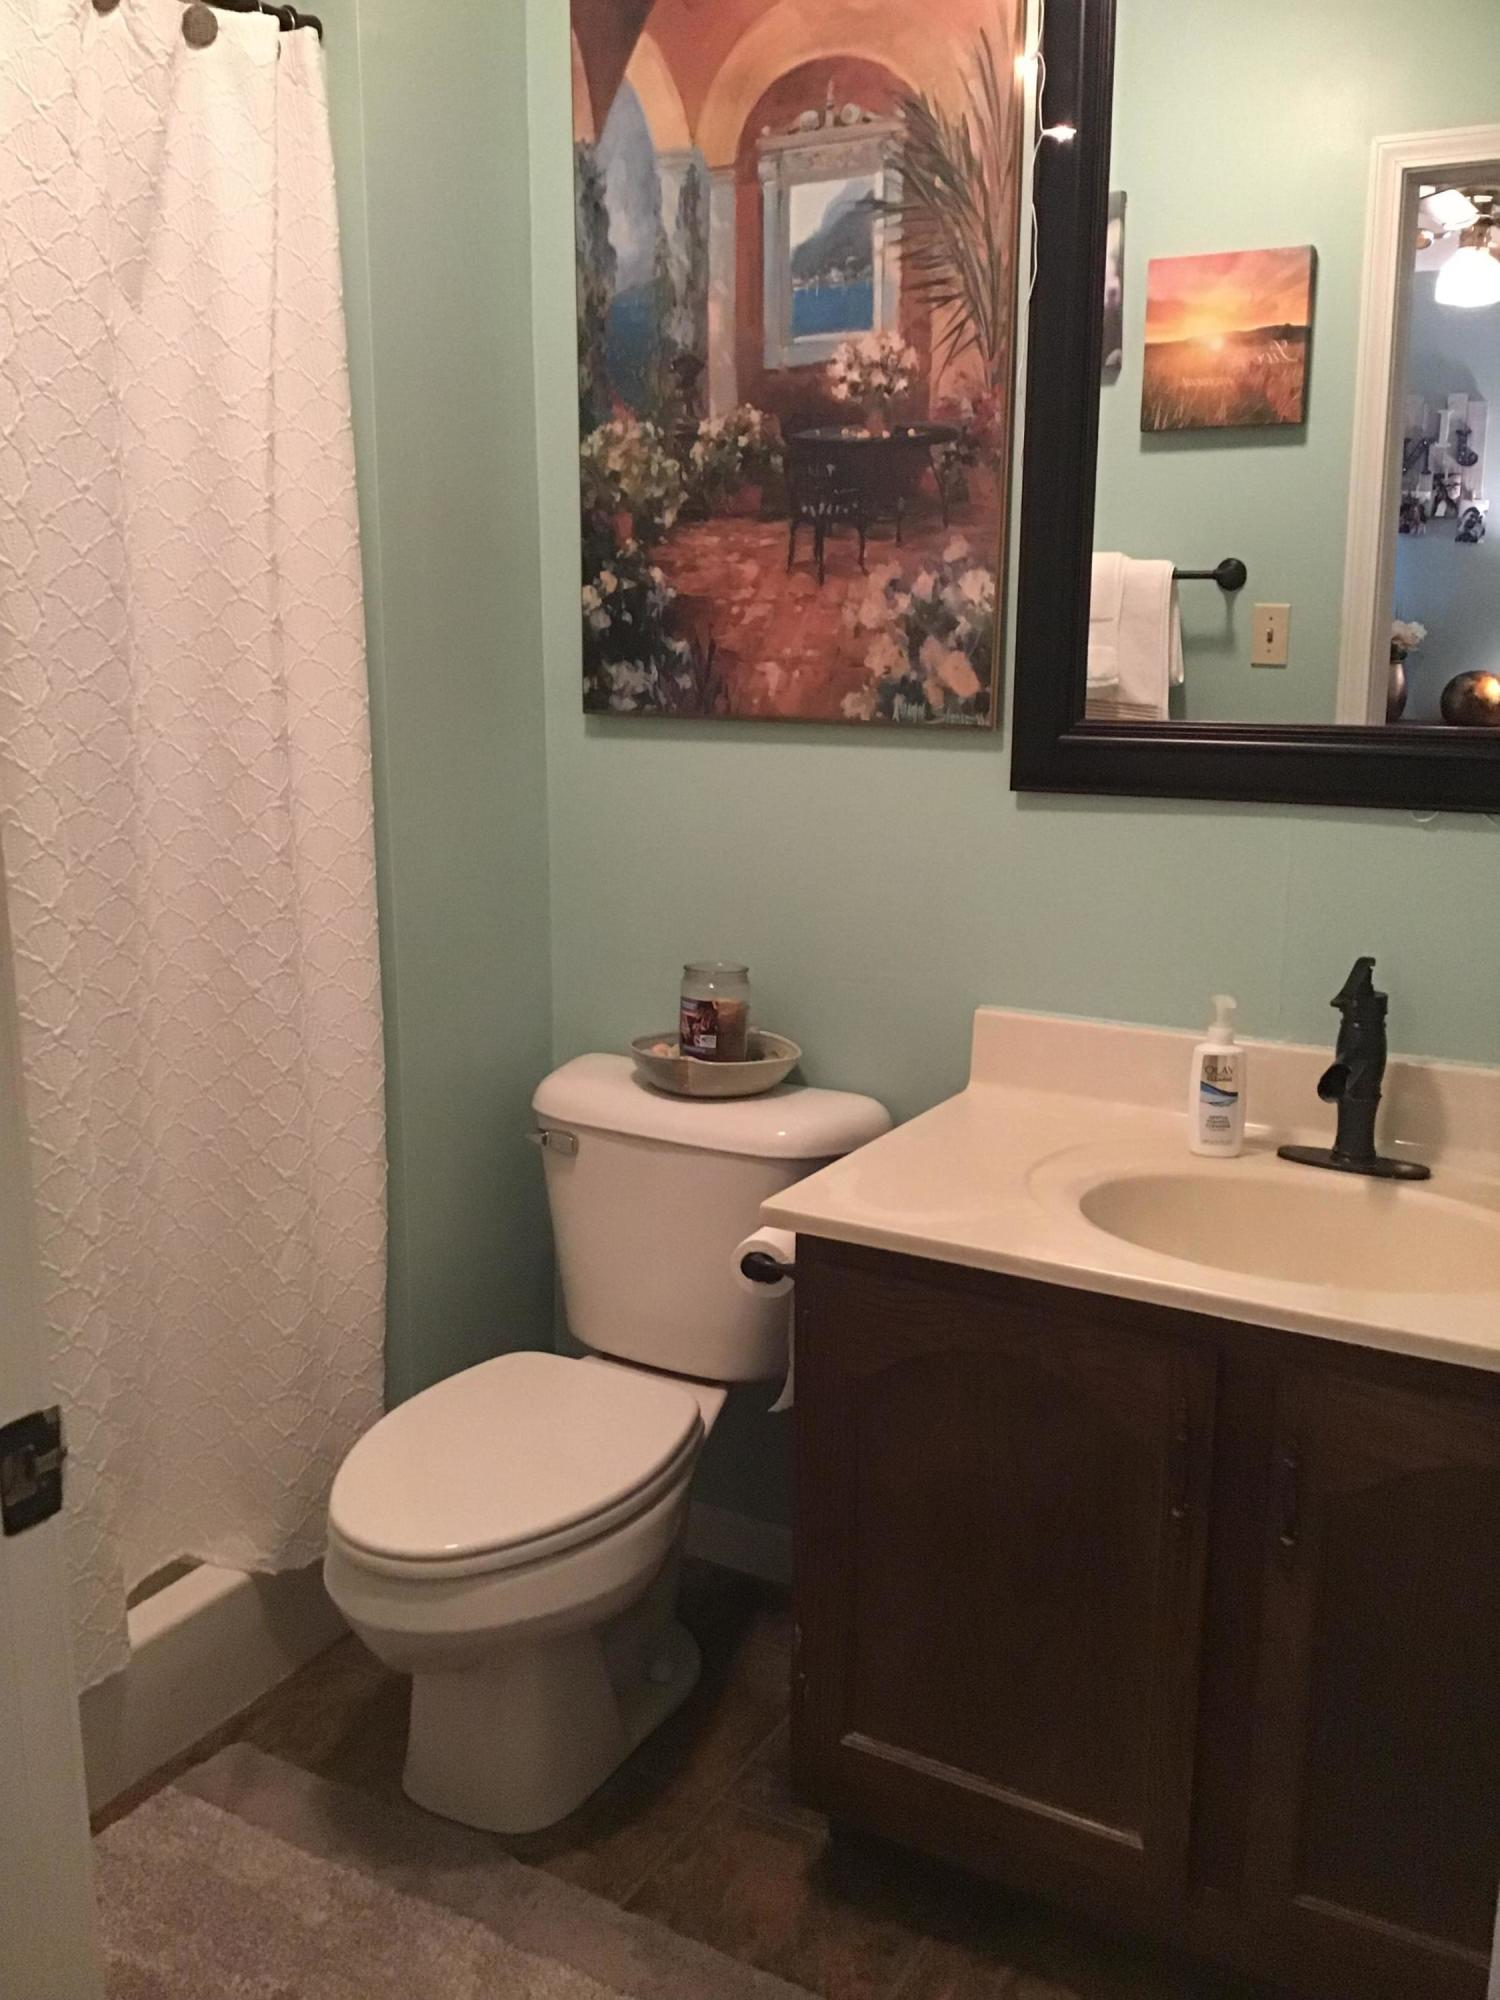 449 Water Oak Drive, Seymour, Tennessee 37865, 3 Bedrooms Bedrooms, ,3 BathroomsBathrooms,Single Family,For Sale,Water Oak,1101007